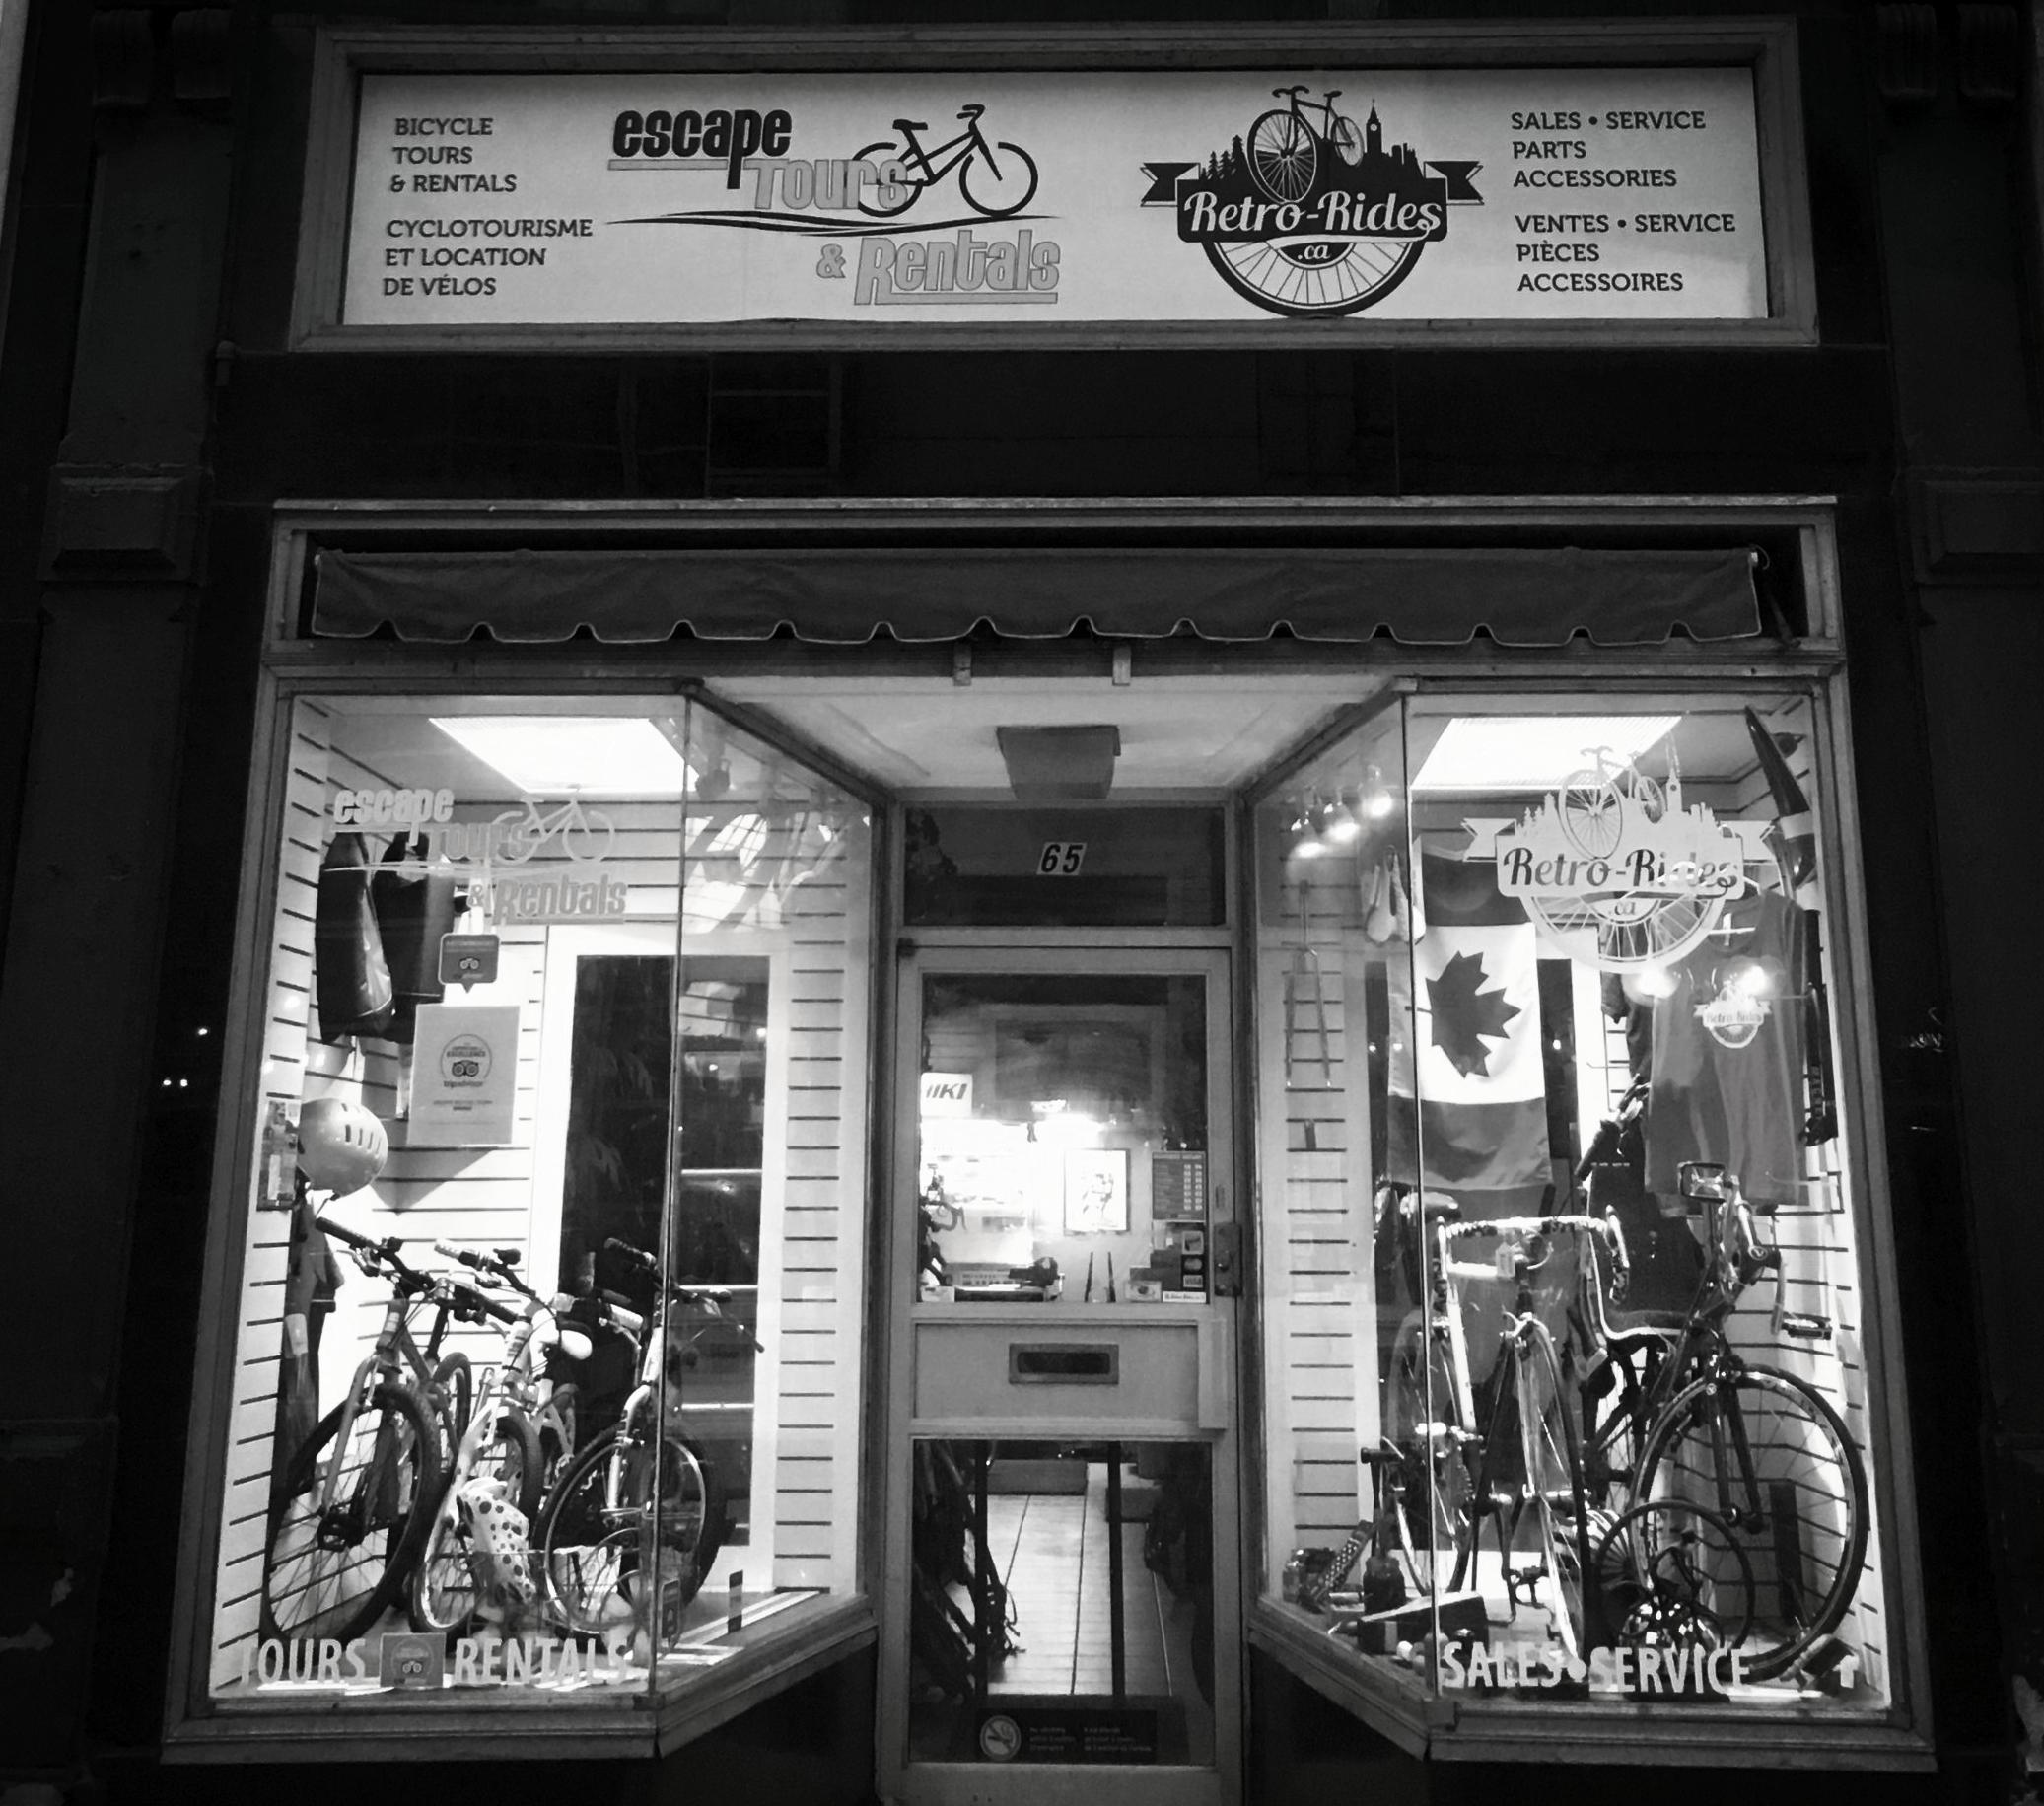 Retro-Rides.ca 65 Sparks St. Ottawa, Ontario Canada K1P 5A5